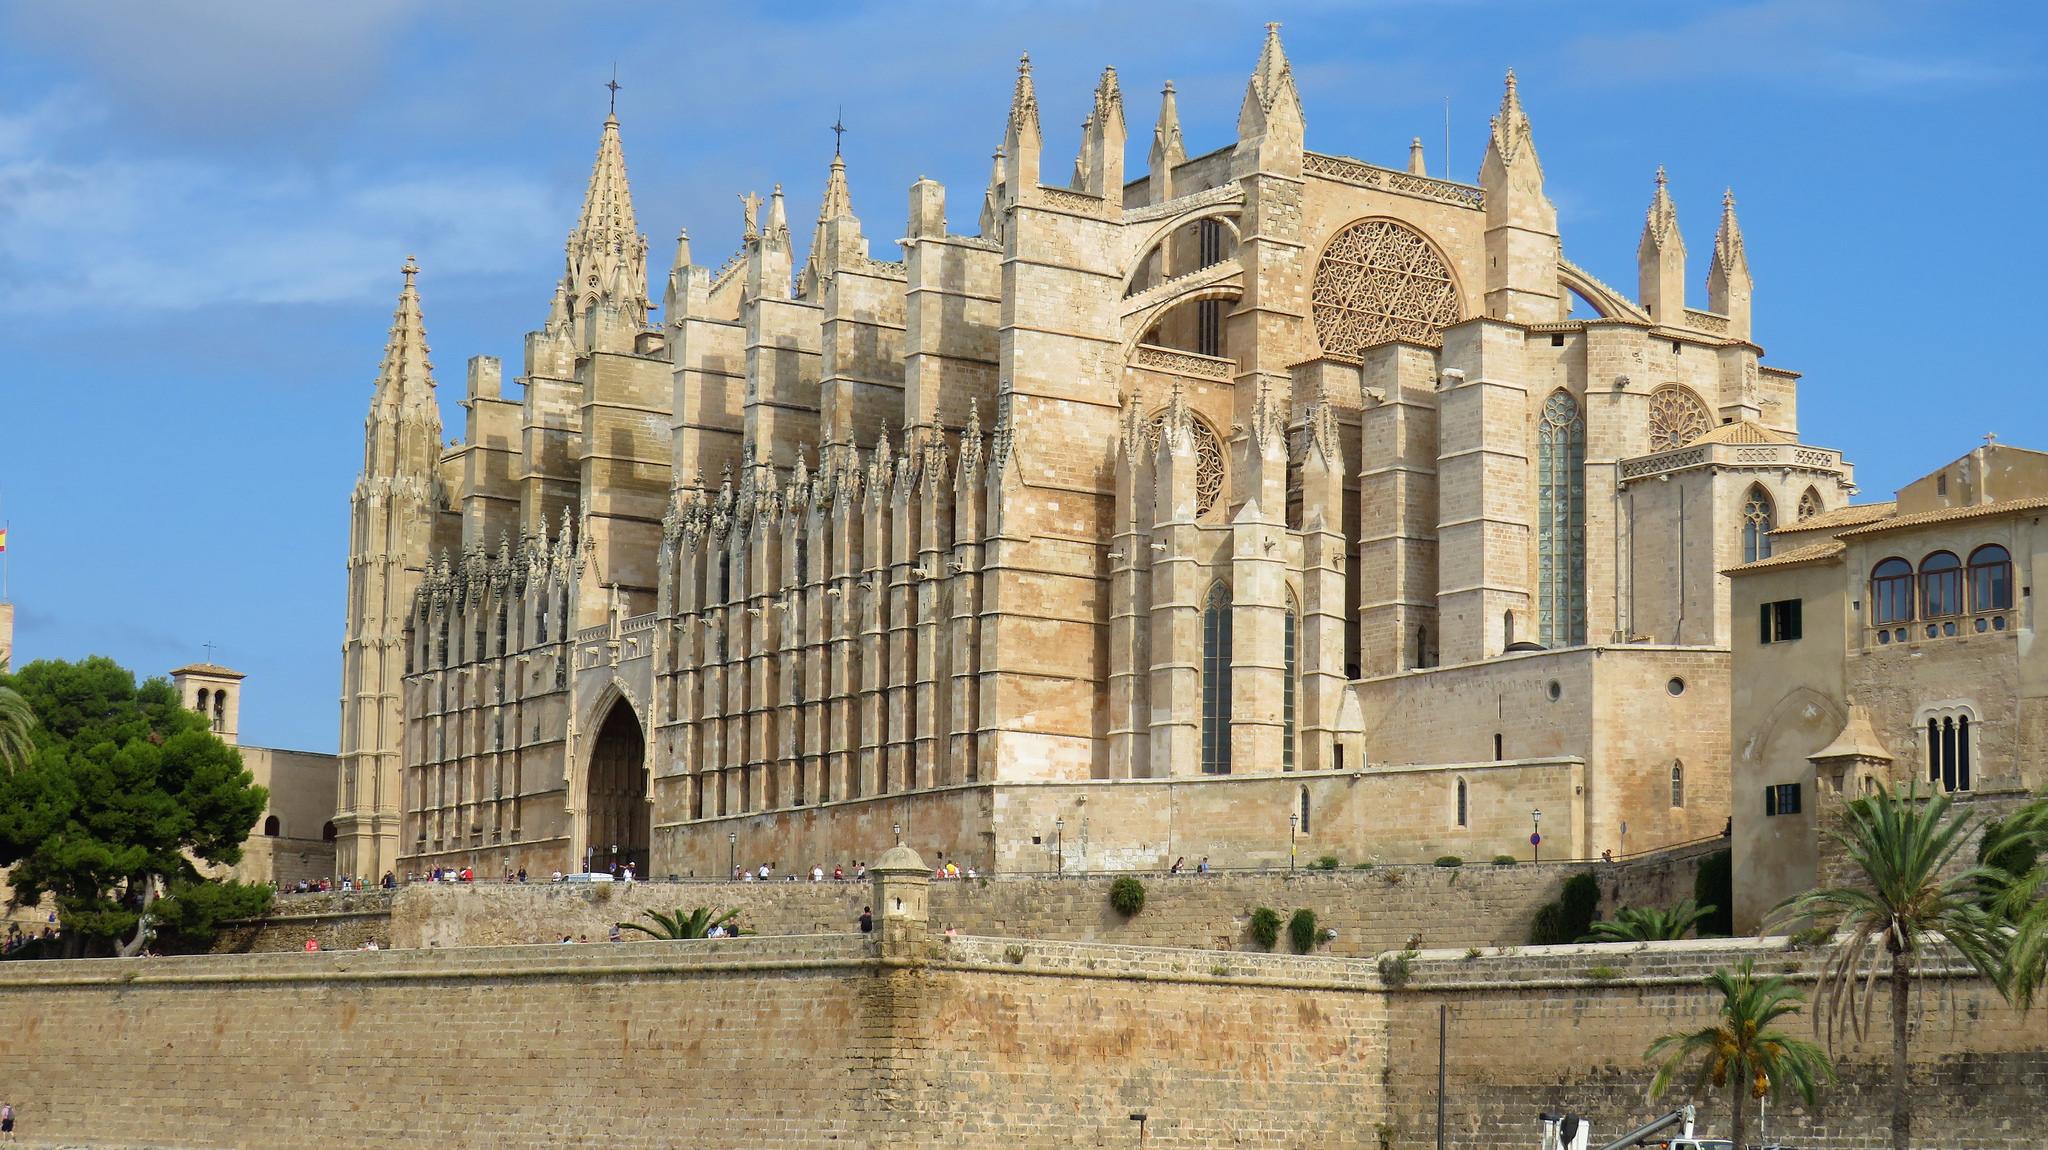 La Cathédrale de Majorque